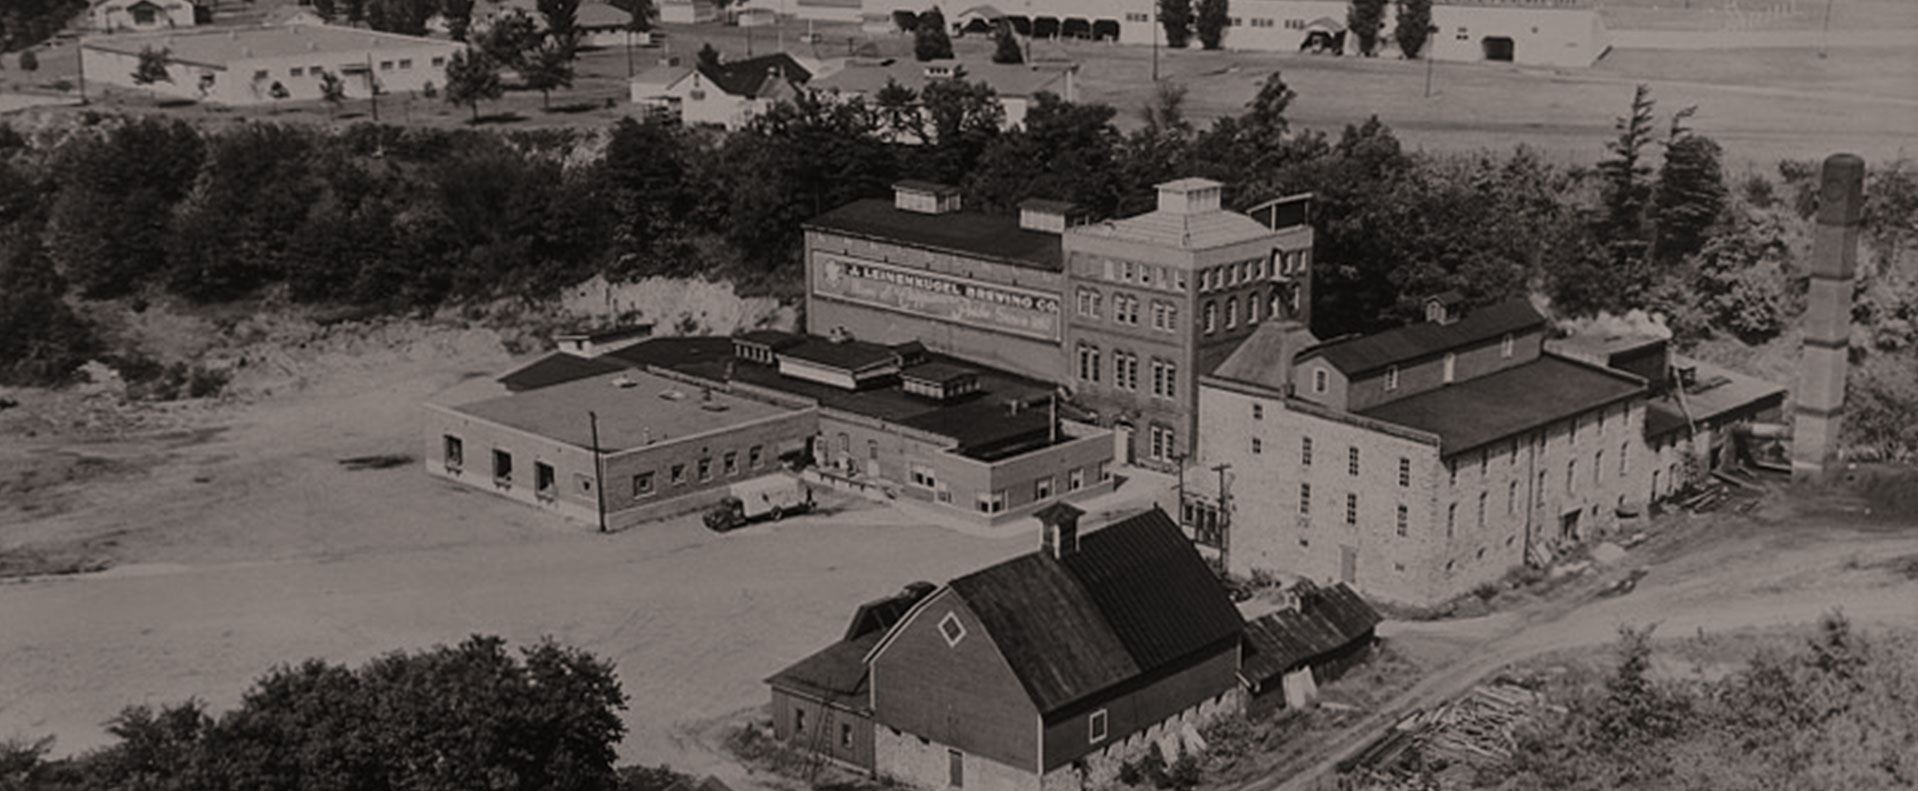 Leinenkugal Brewery Image